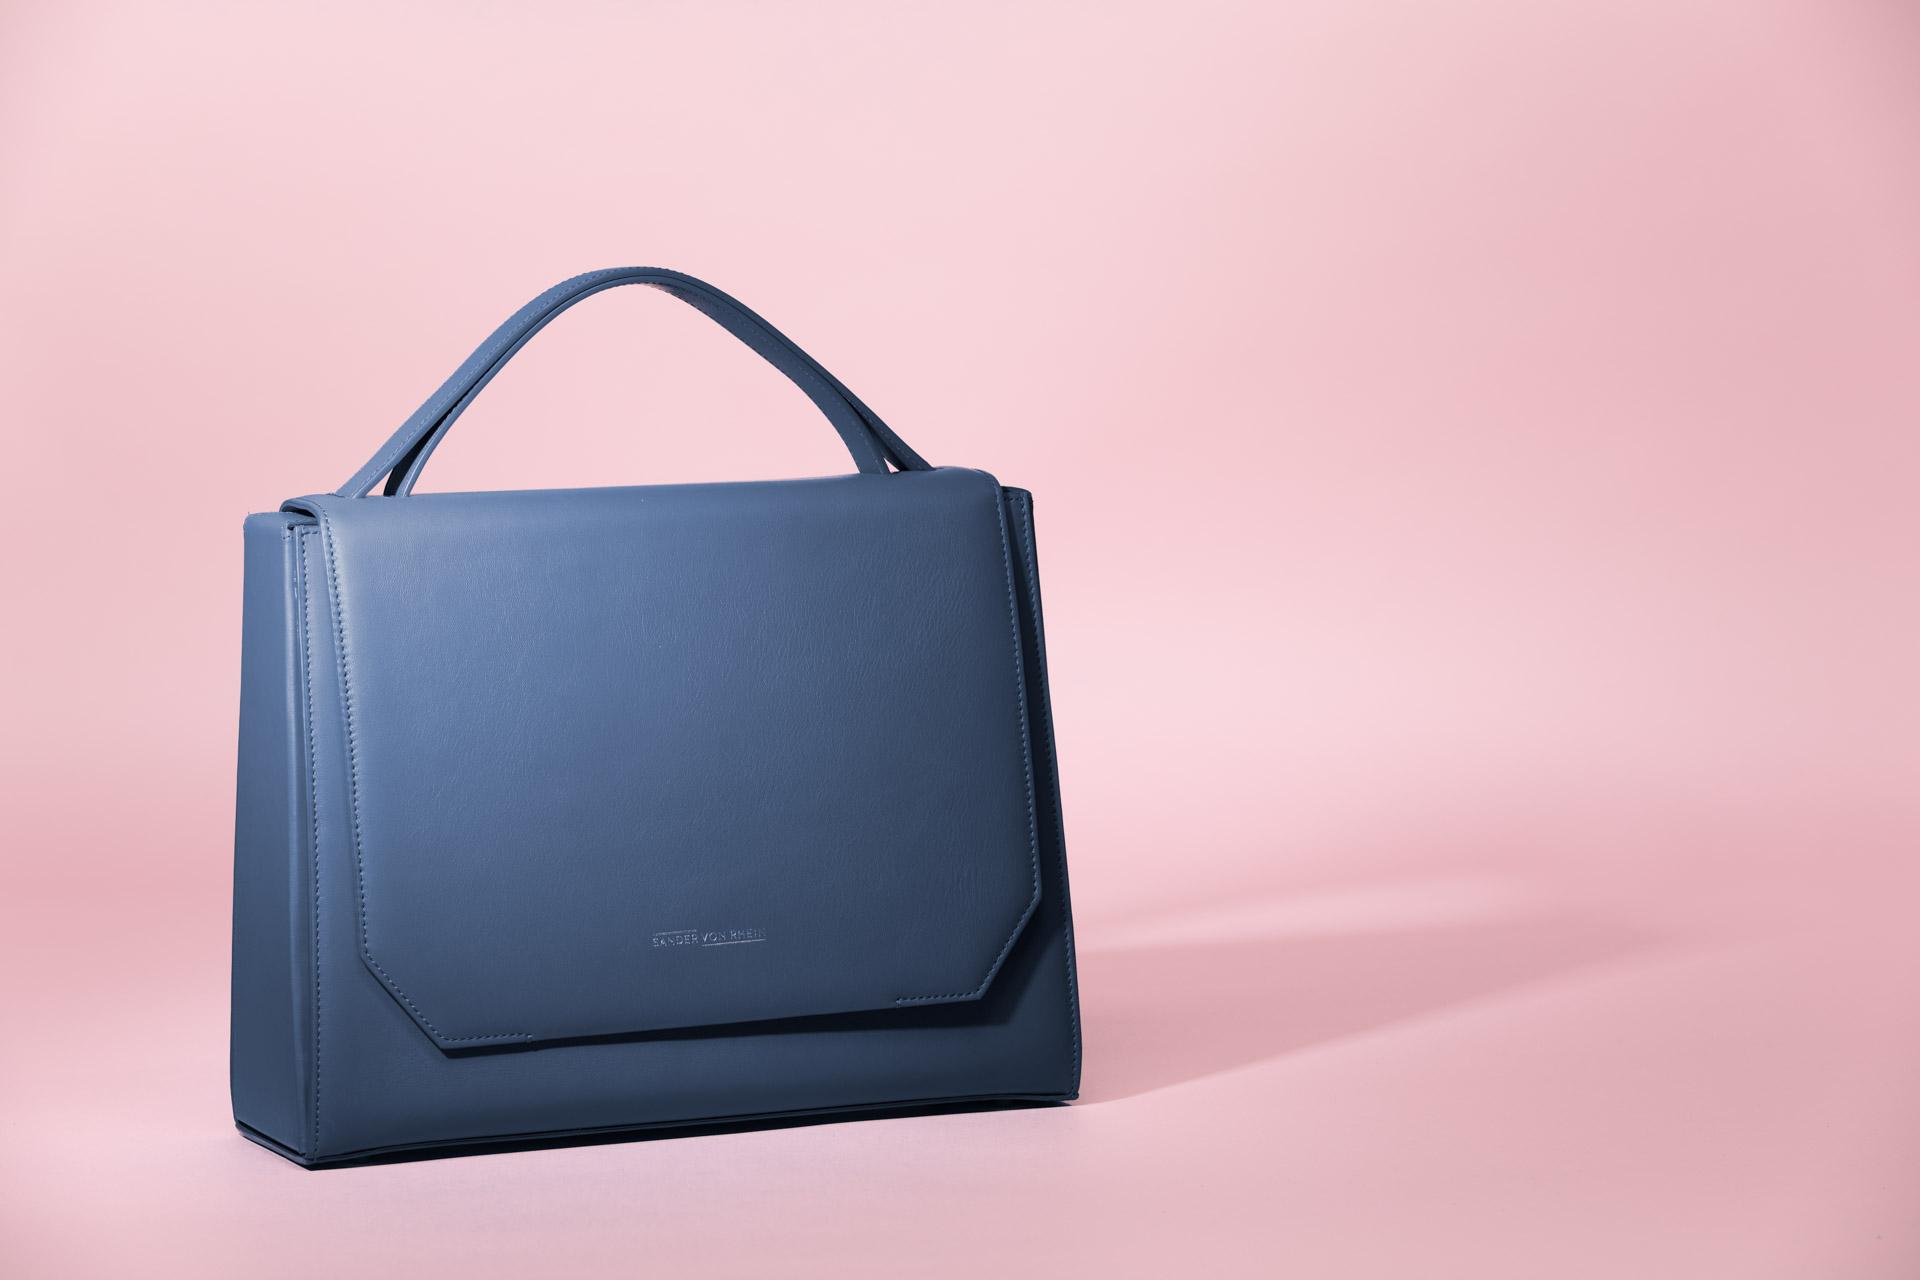 WEB Backup bags shop presentation-2.jpg